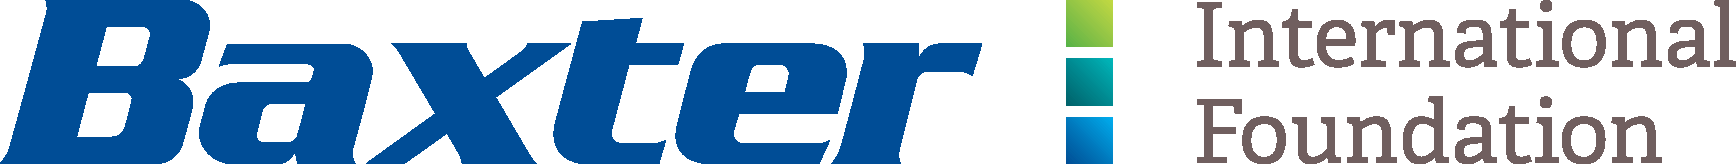 baxter_foundation_logo